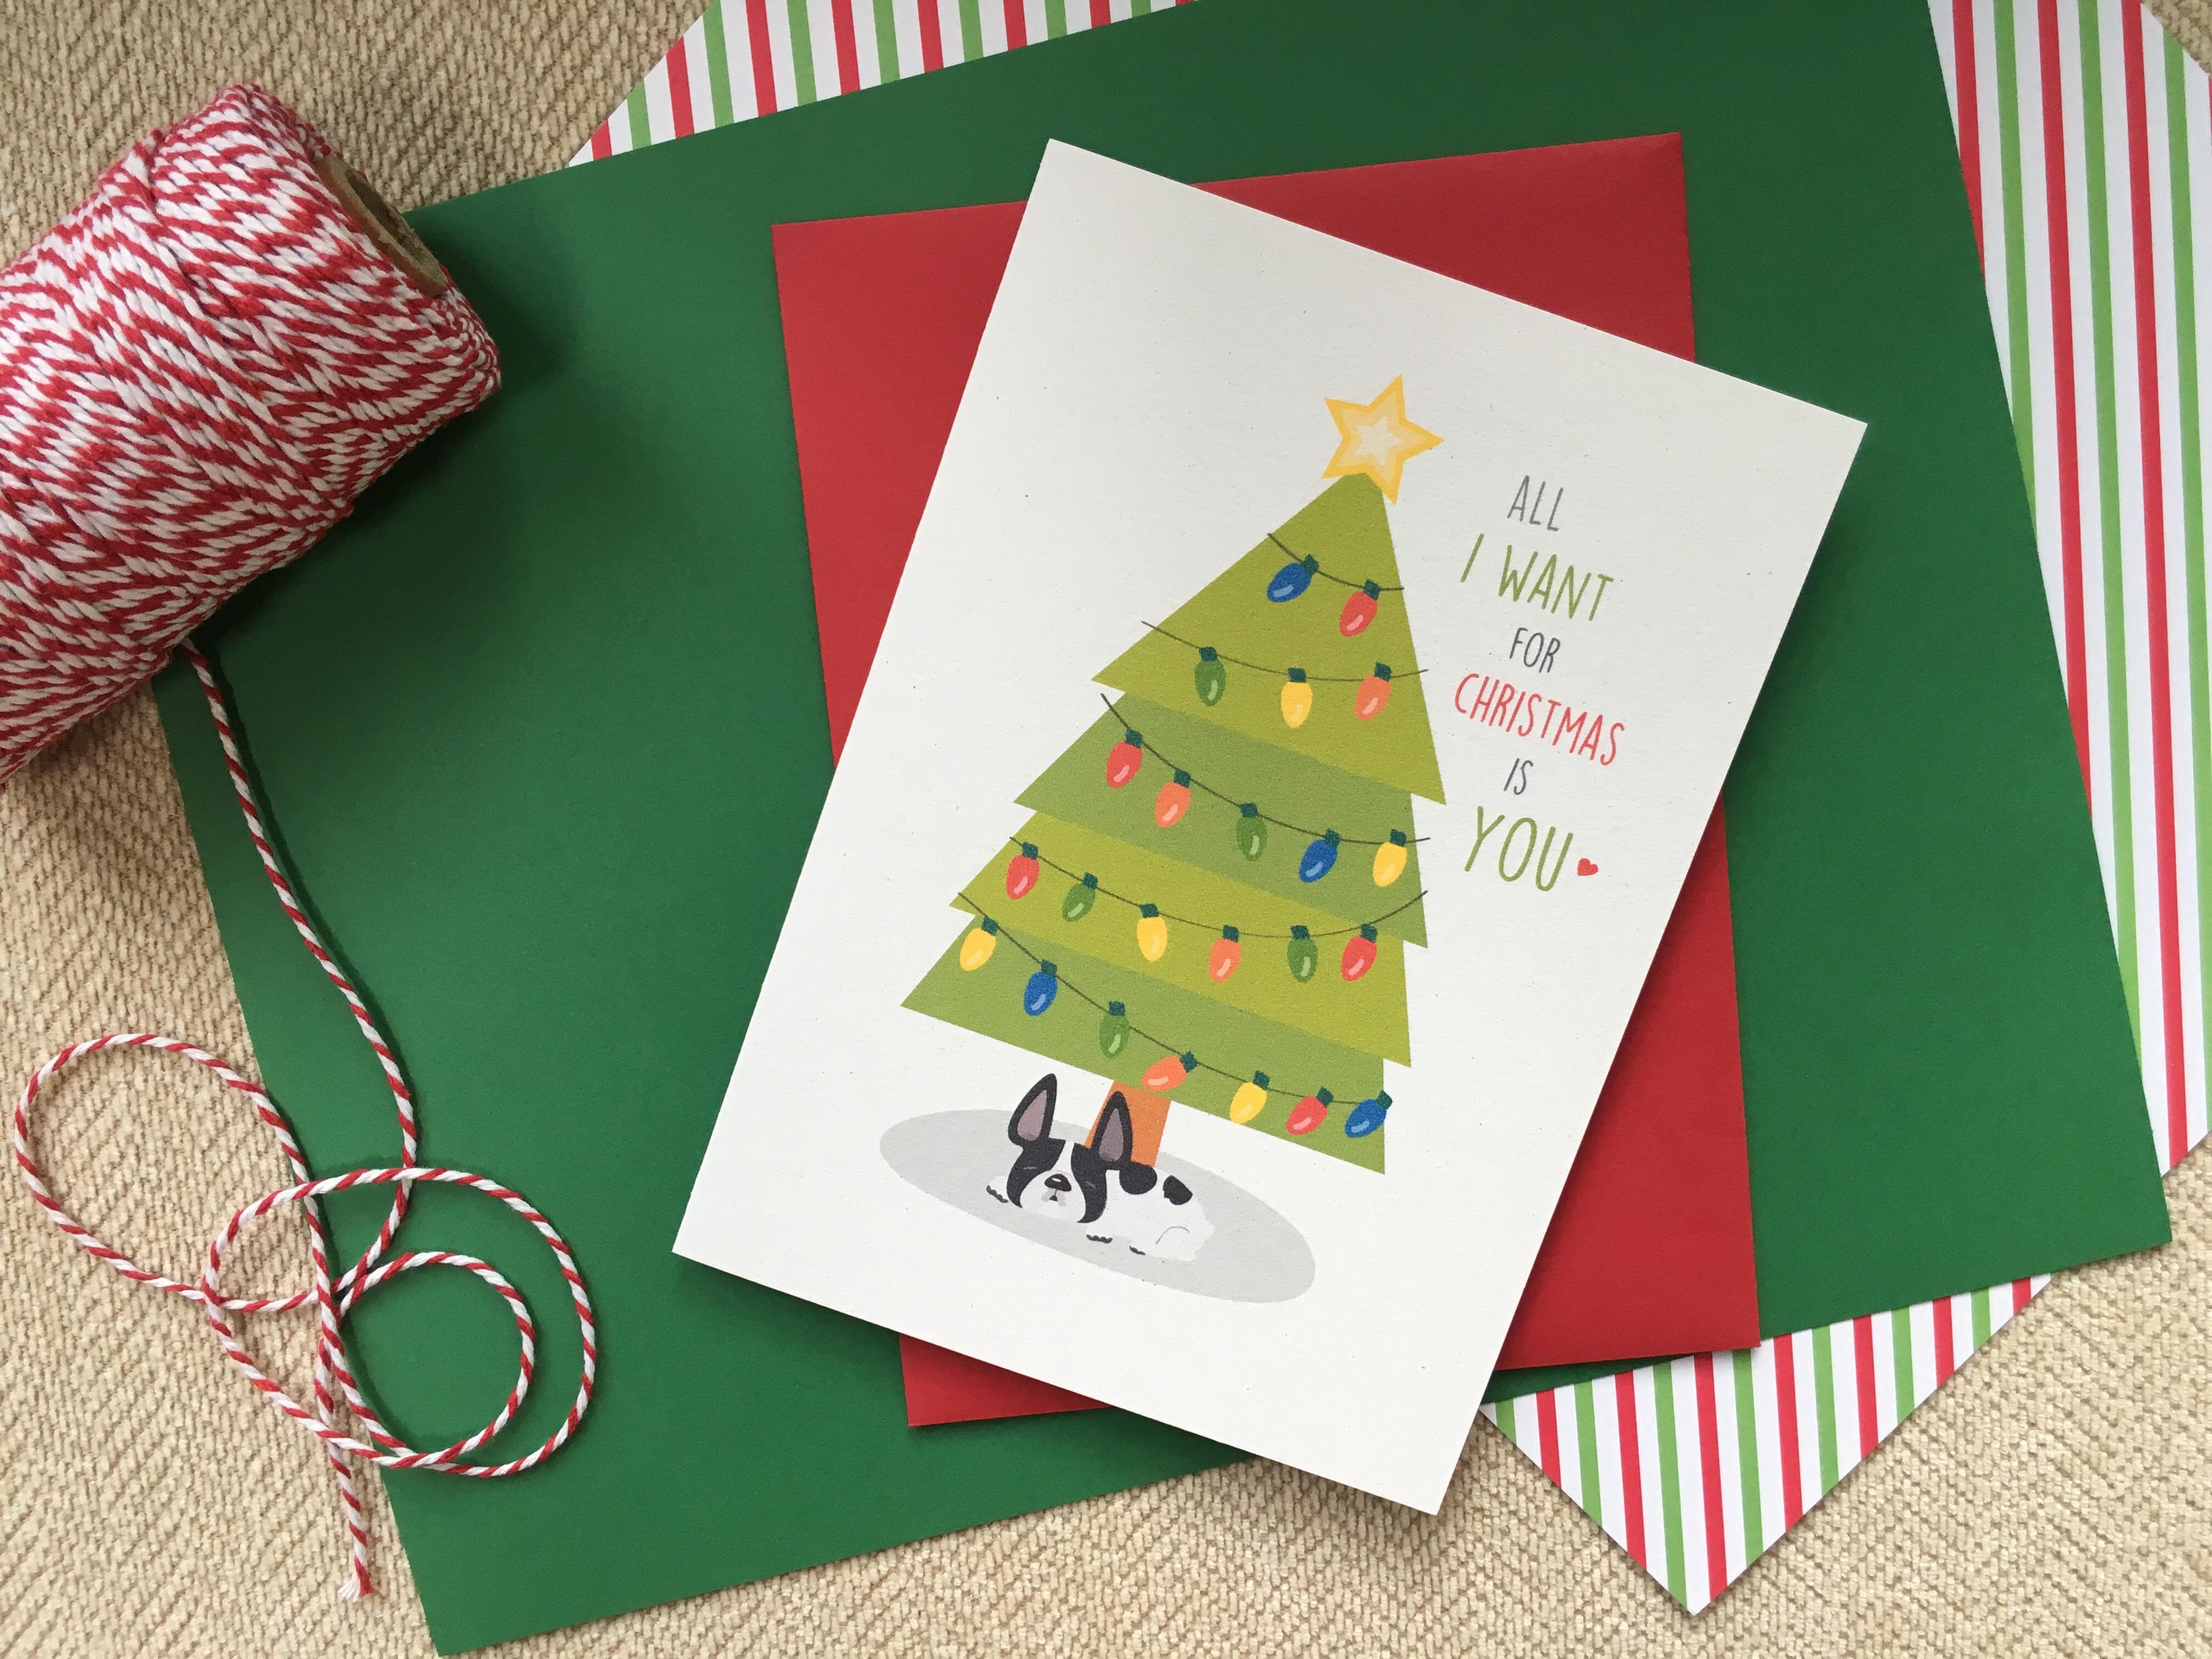 French Bulldog Holiday Card Collection – FRENCH BULLDOG LOVE